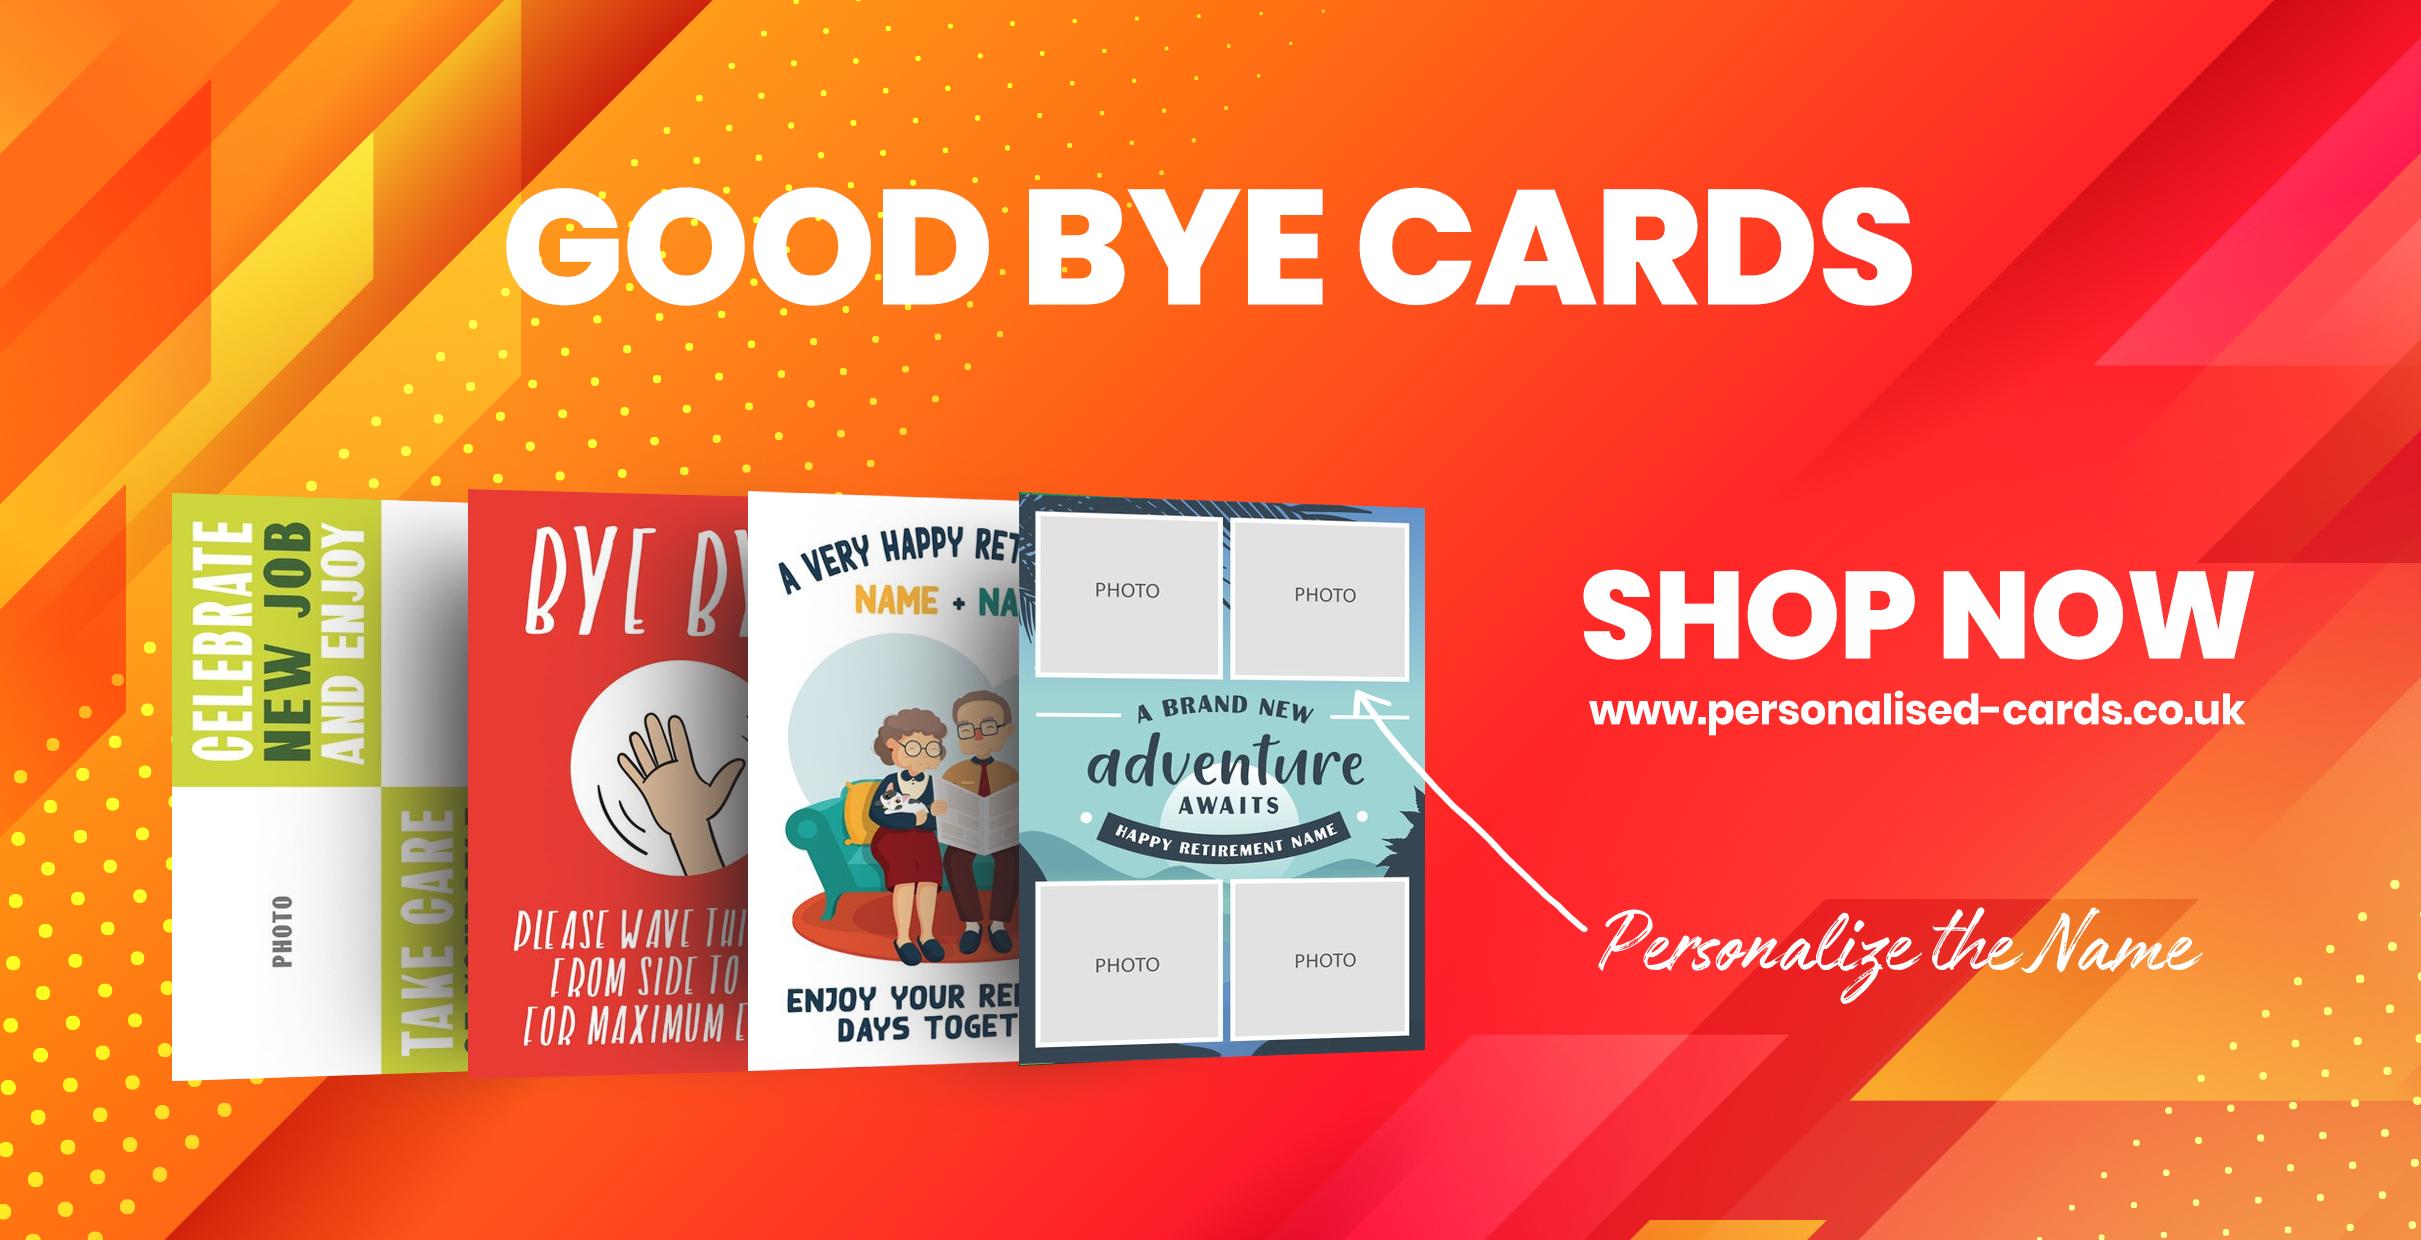 good-bye-cards.jpg